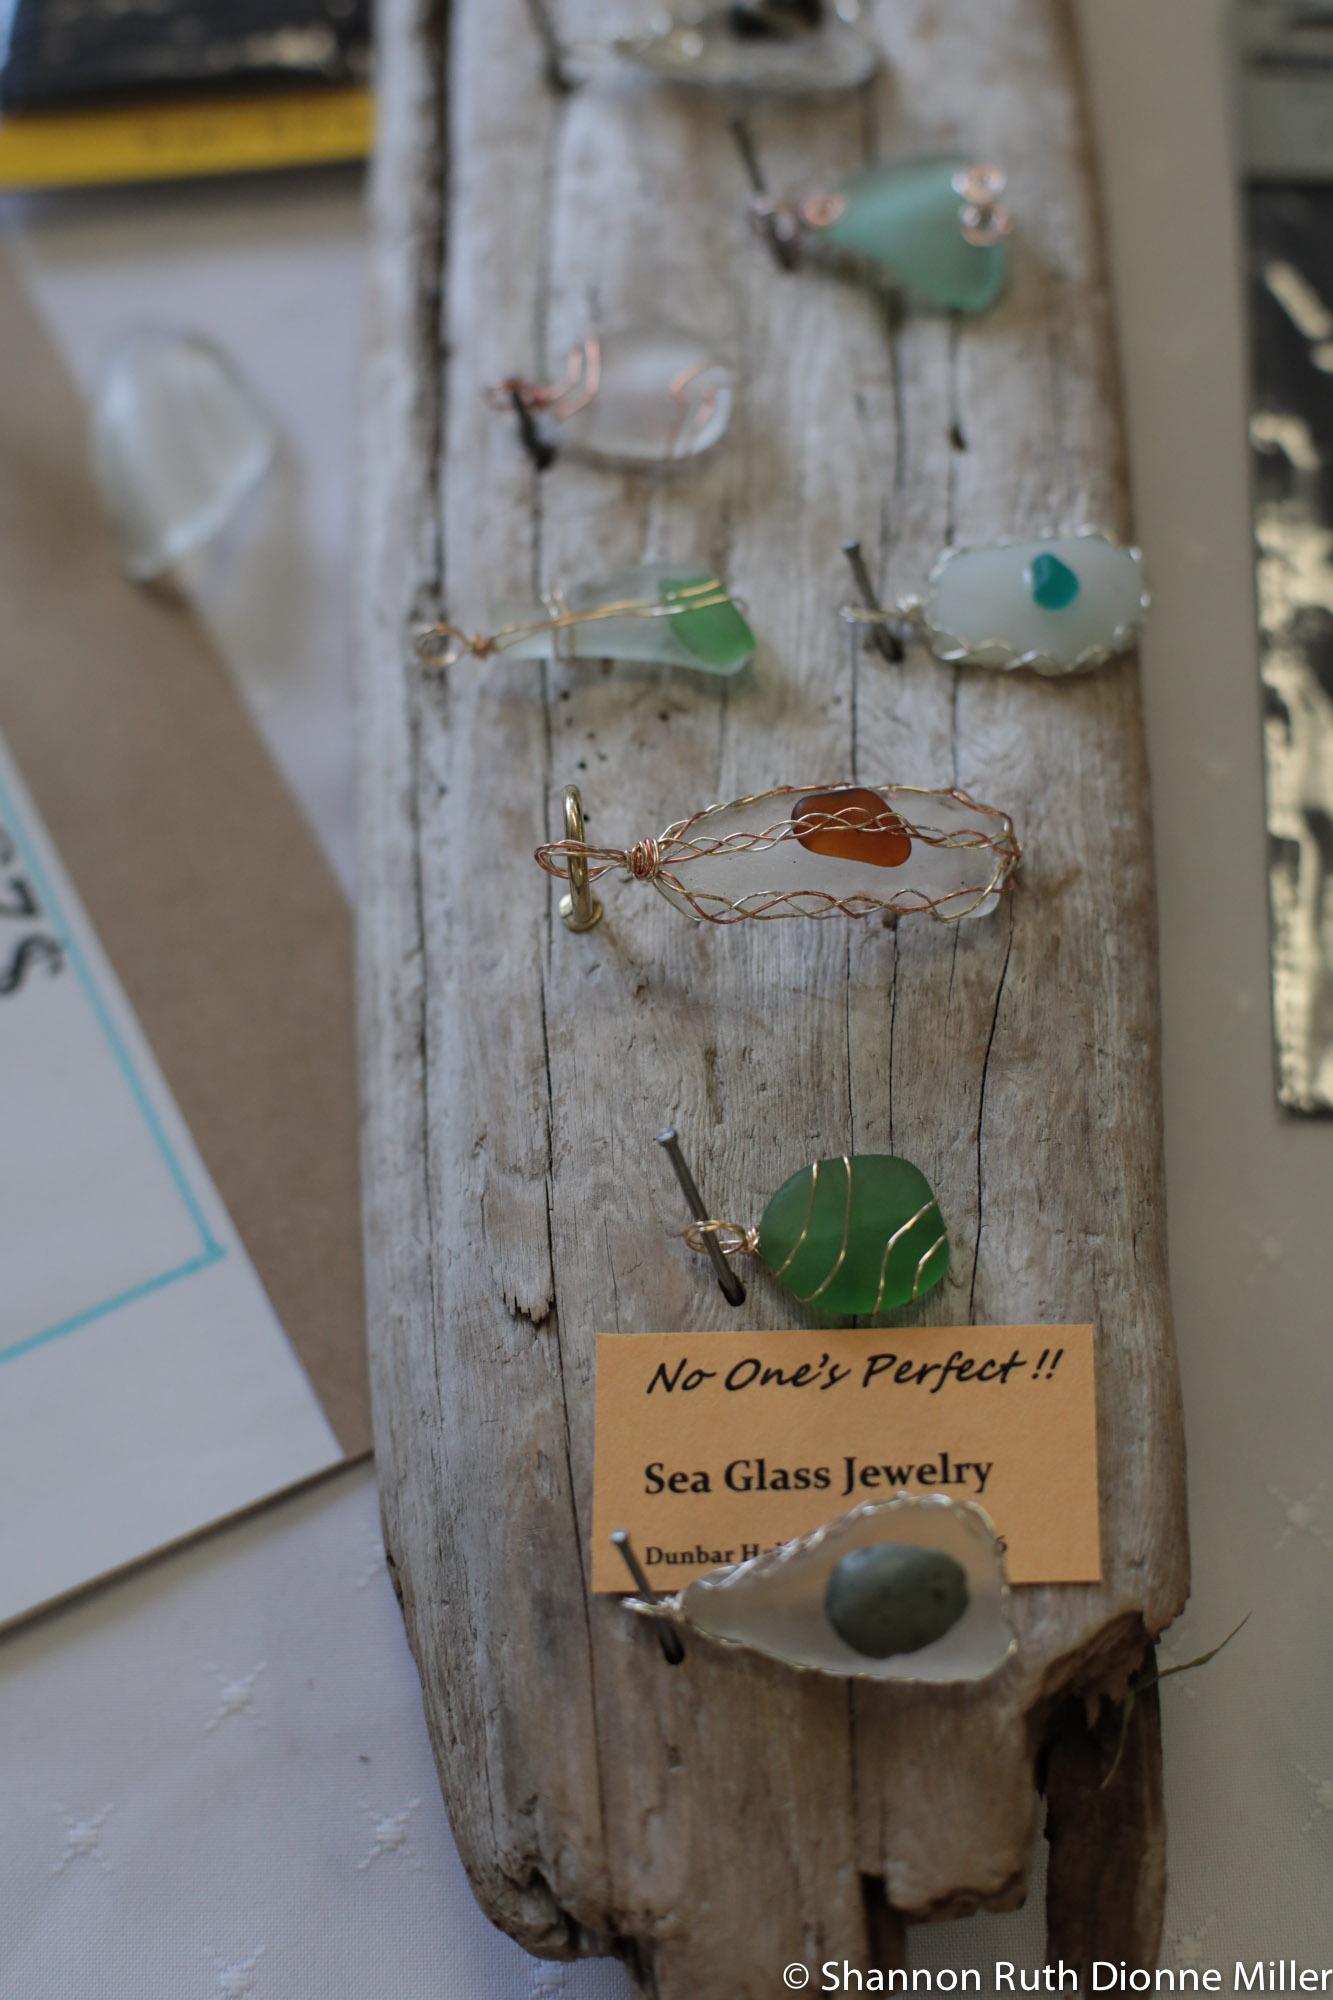 No One's Perfect, Sea Glass Jewelry.